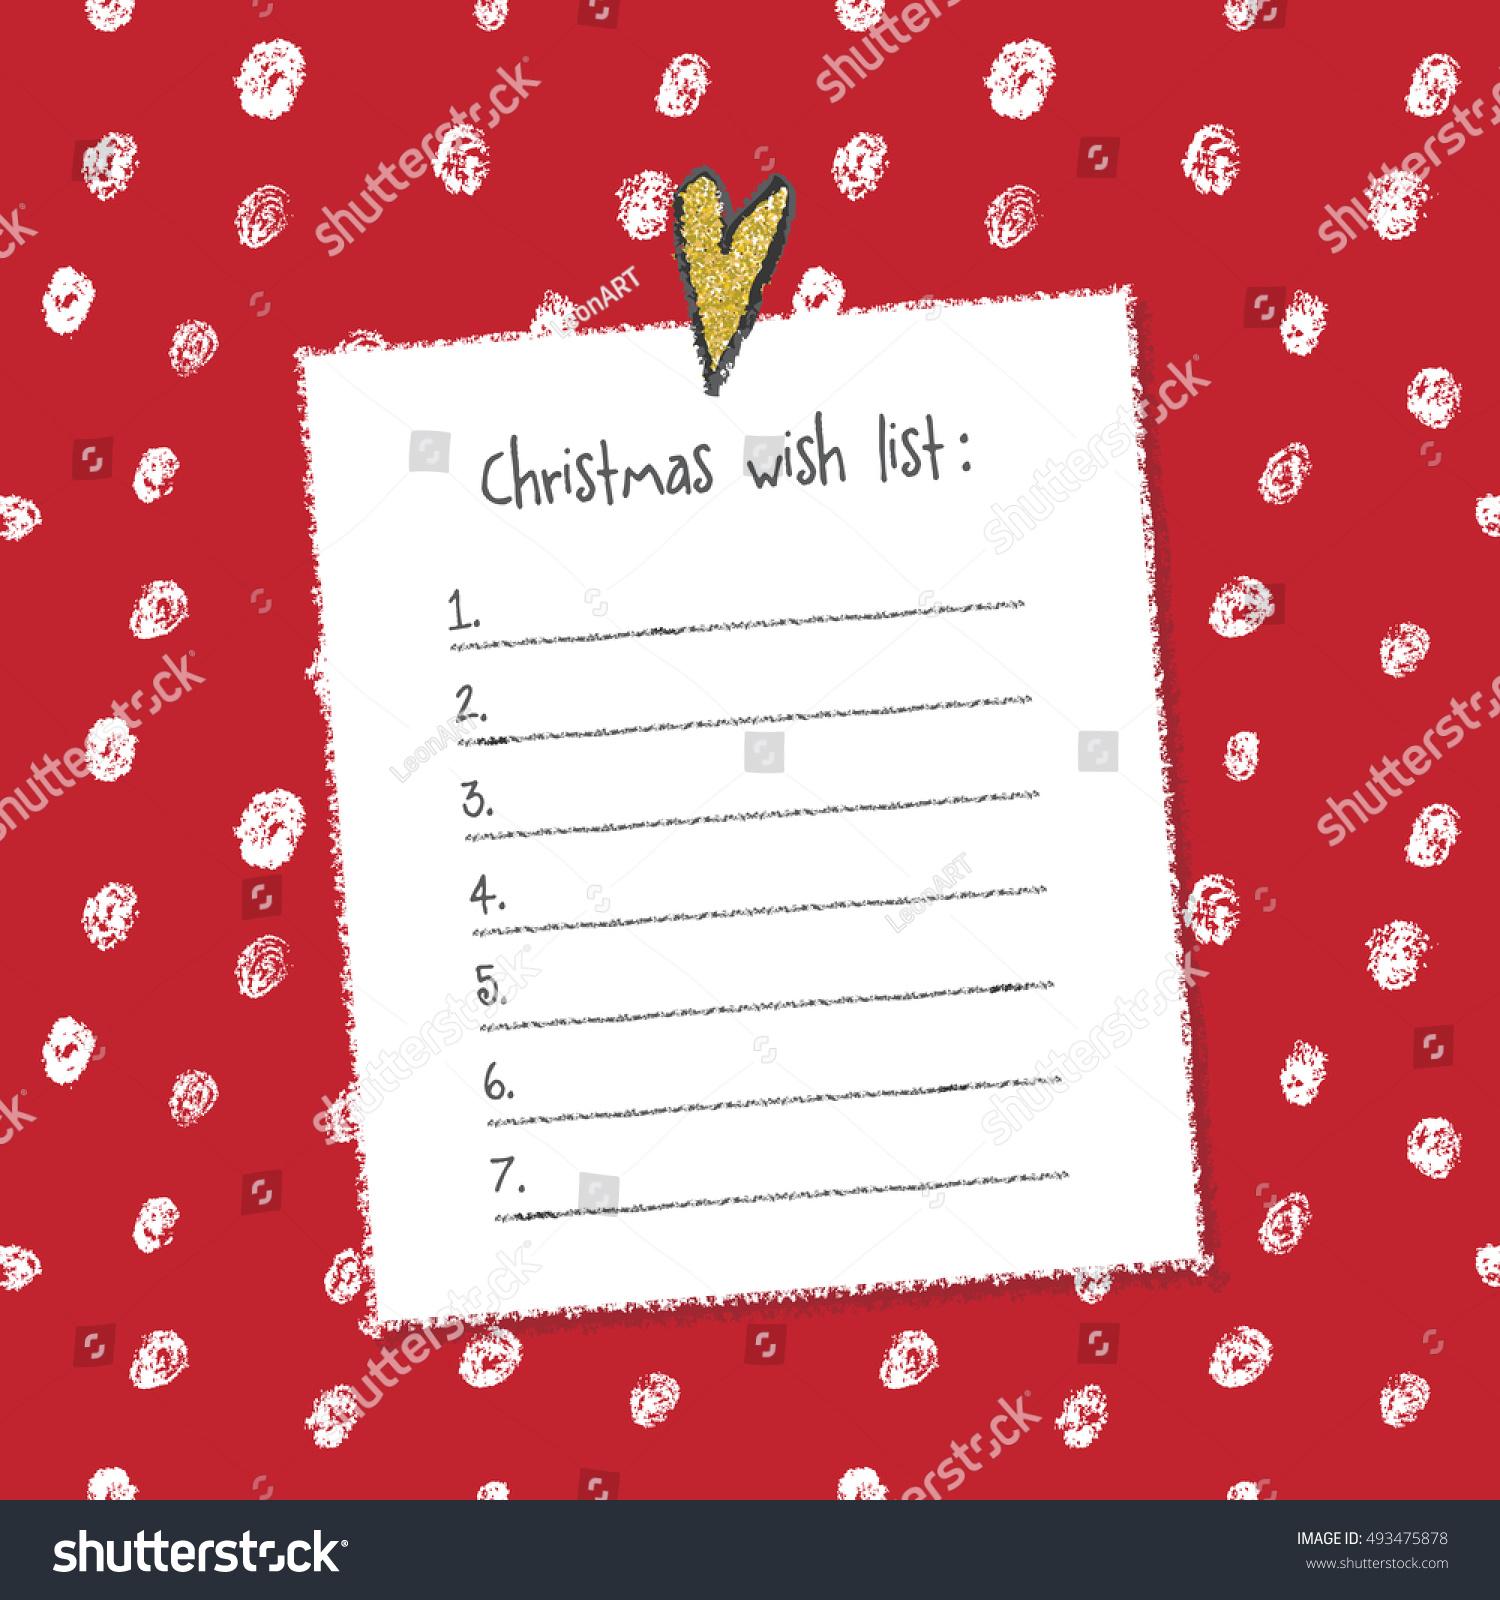 Christmas Wish List Template Hand Drawn Stock Vector 493475878 ...